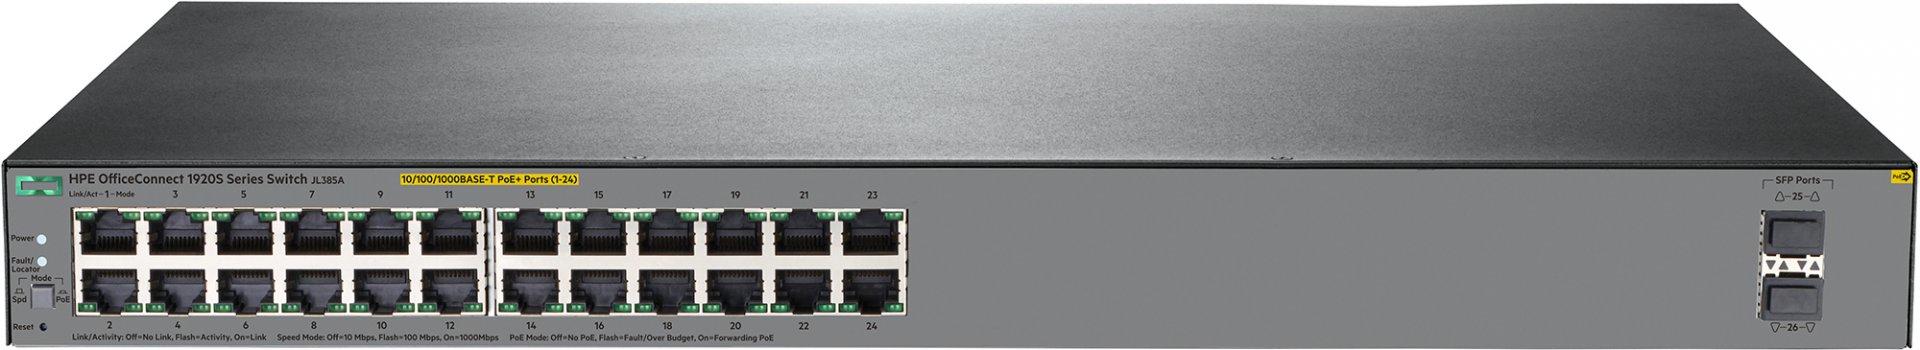 HP Enterprise OfficeConnect 1920S 24G 2SFP PoE+ 370W - Managed - L3 - Gigabit Ethernet (10/100/1000) - Power over Ethernet (PoE) - Rack-Einbau - 1U